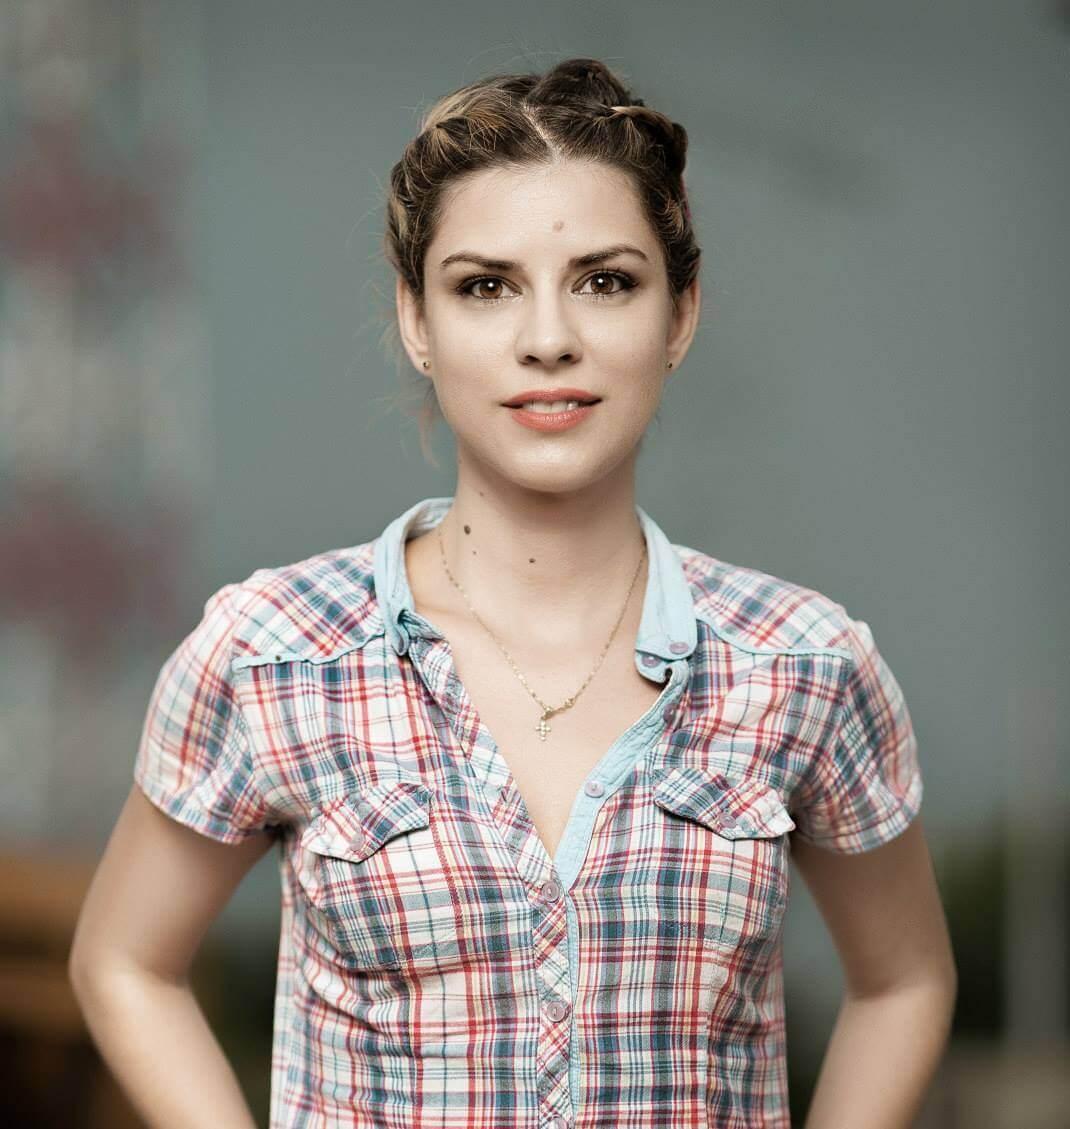 Portretul profesorului ISEE Andreea Drilea